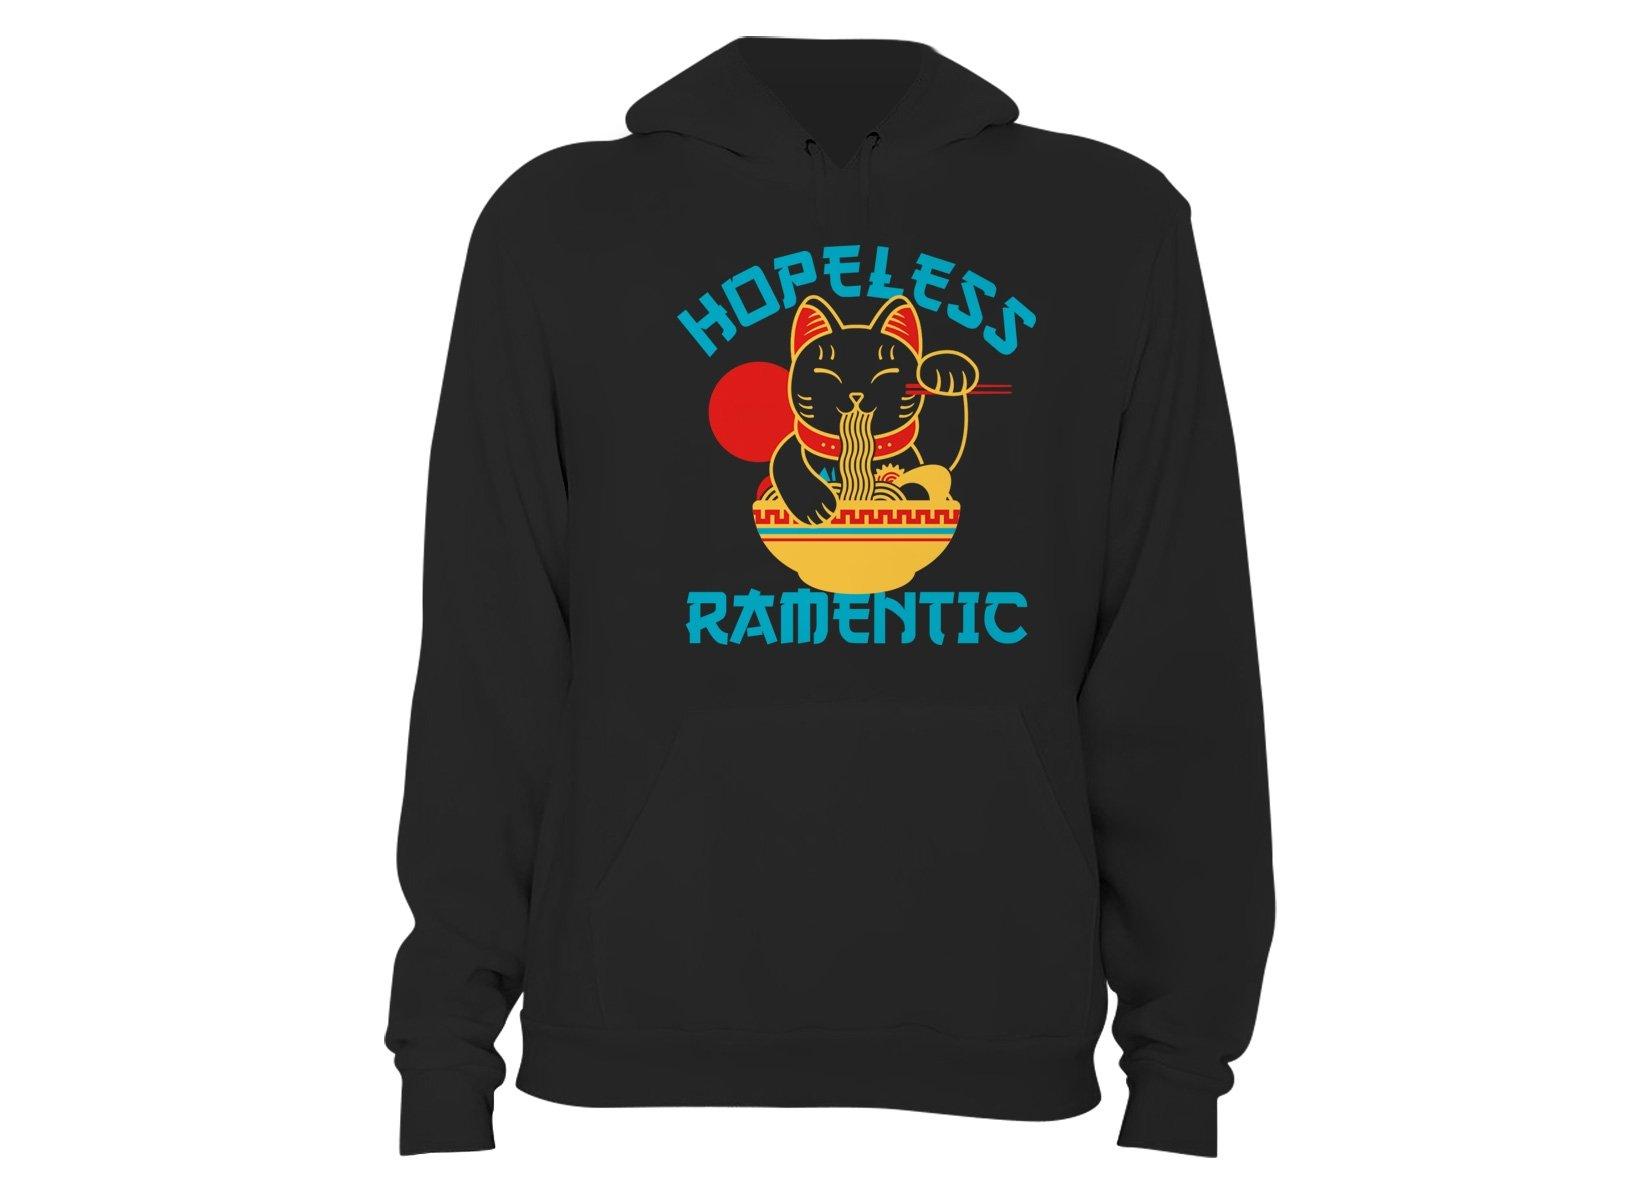 Hopeless Ramentic on Hoodie